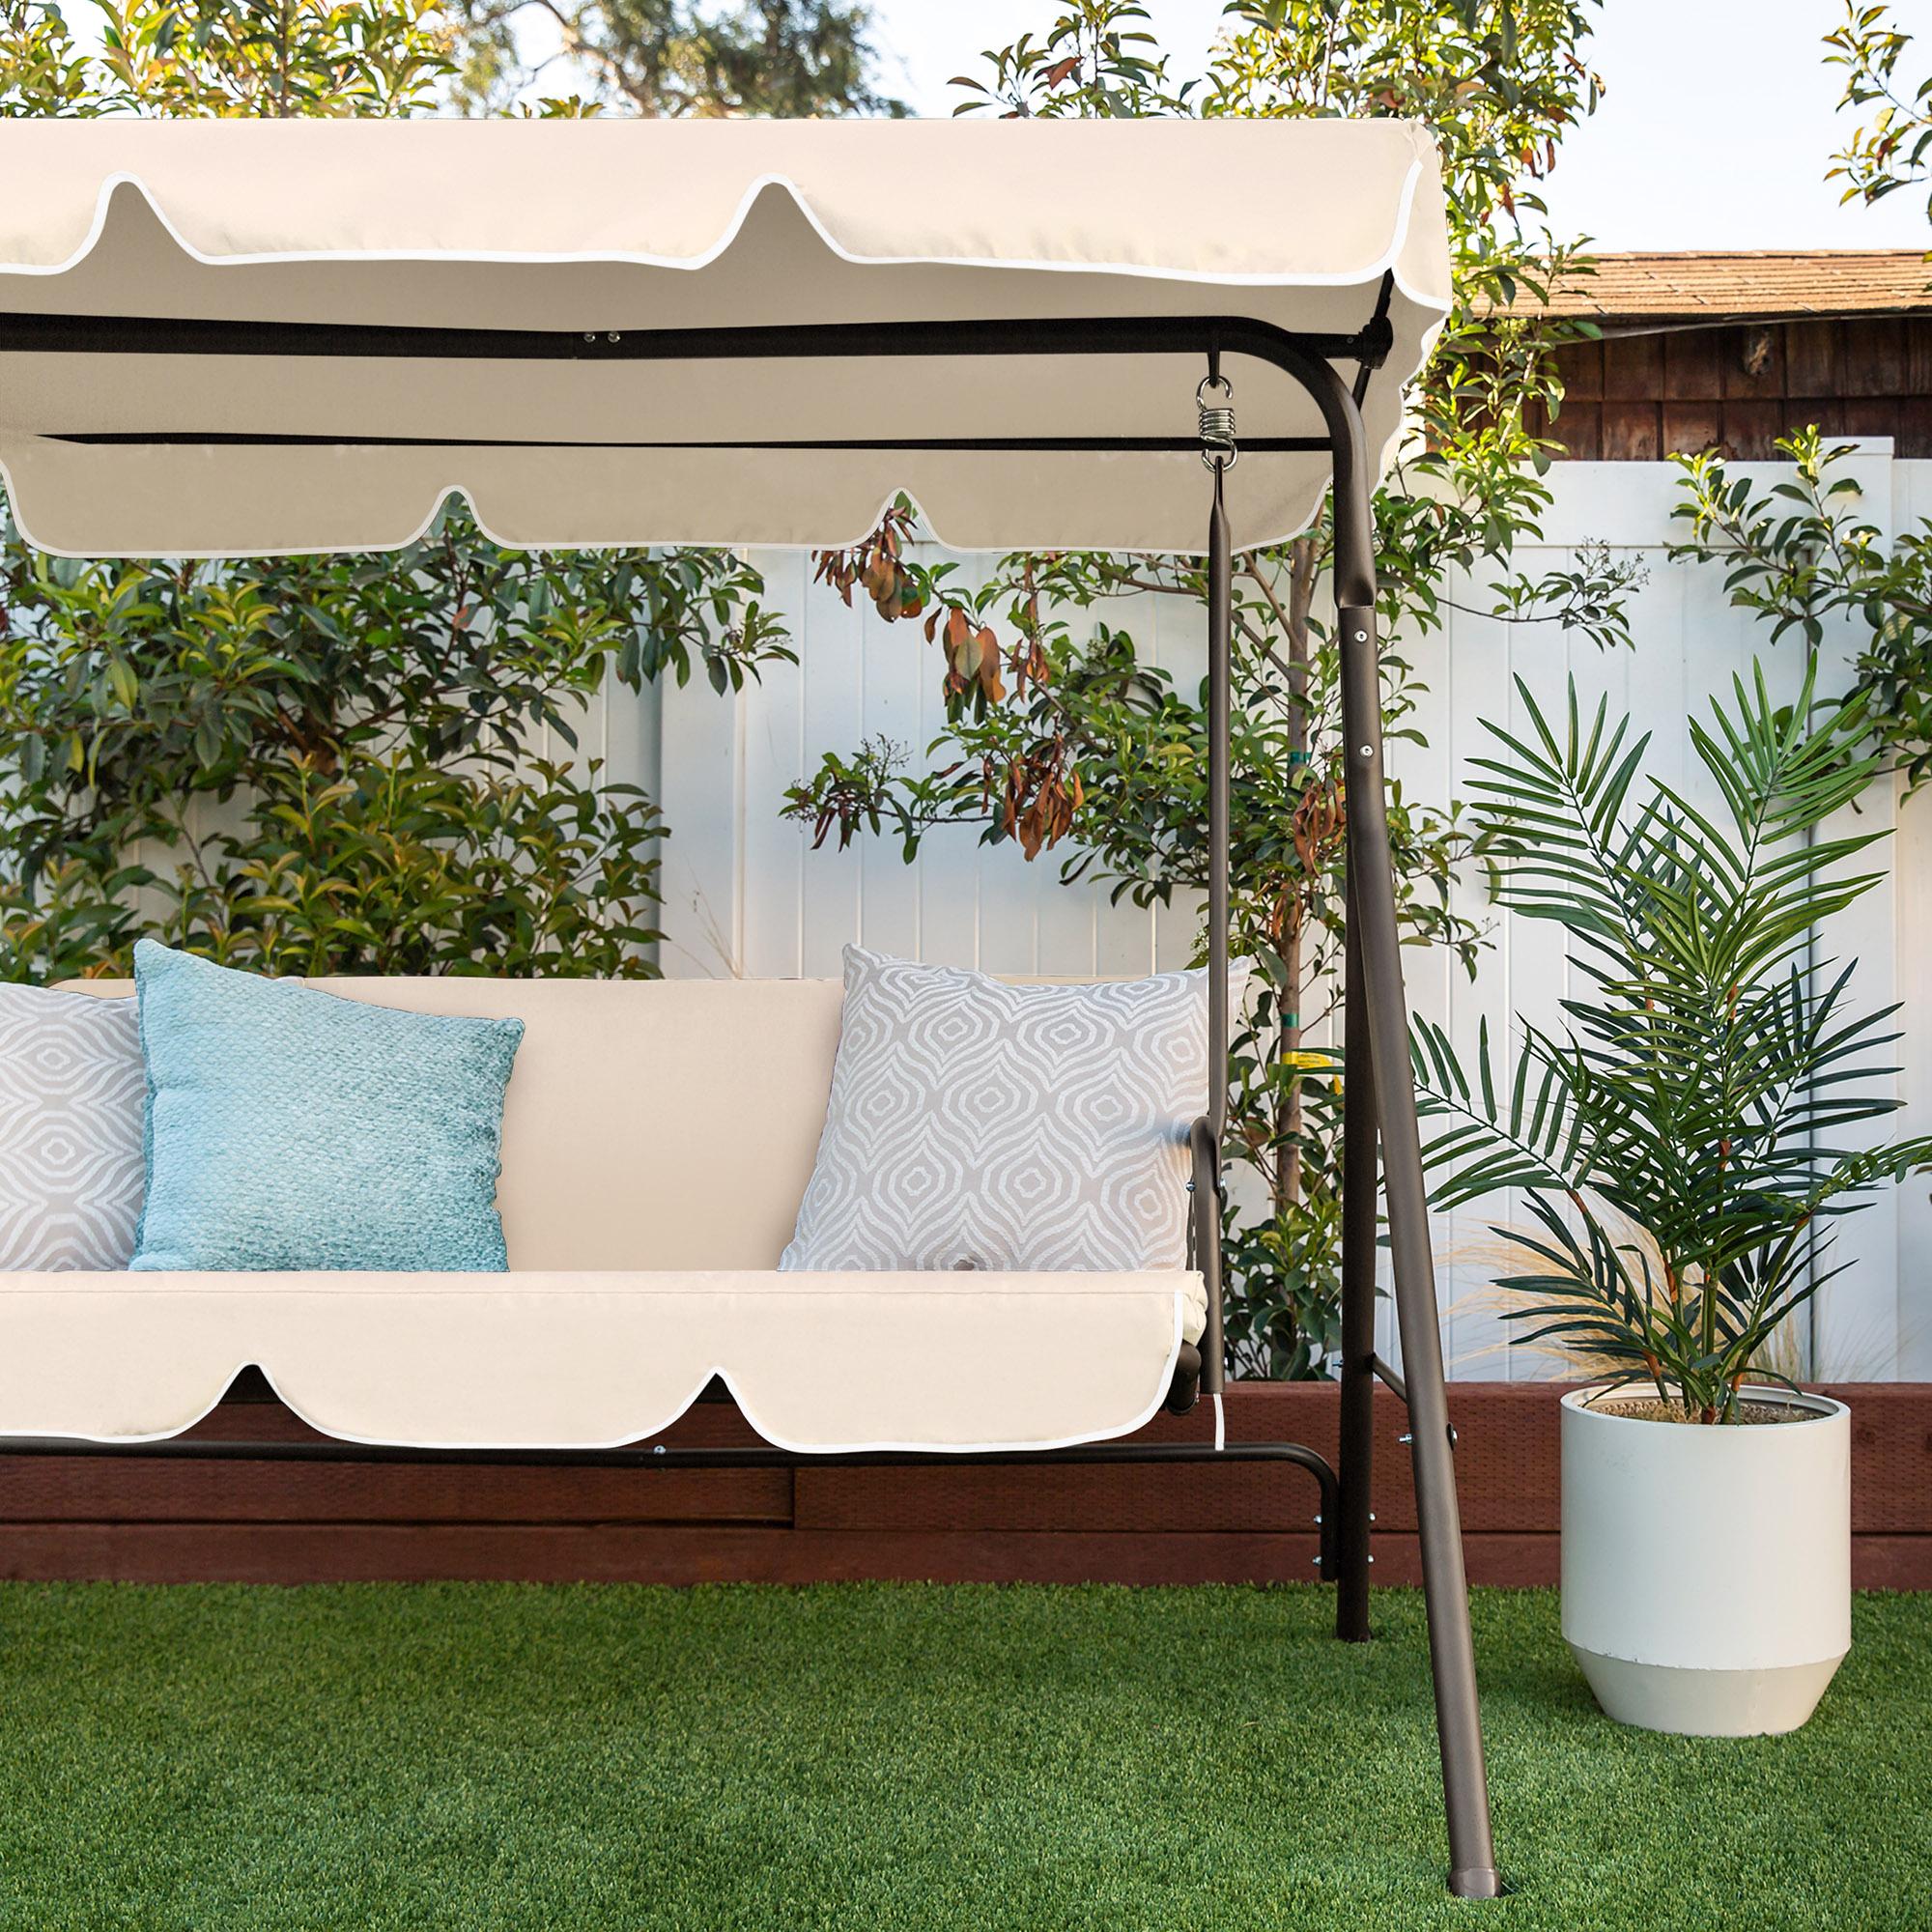 Bcp 2 Person Canopy Swing Glider W Cushions Ebay